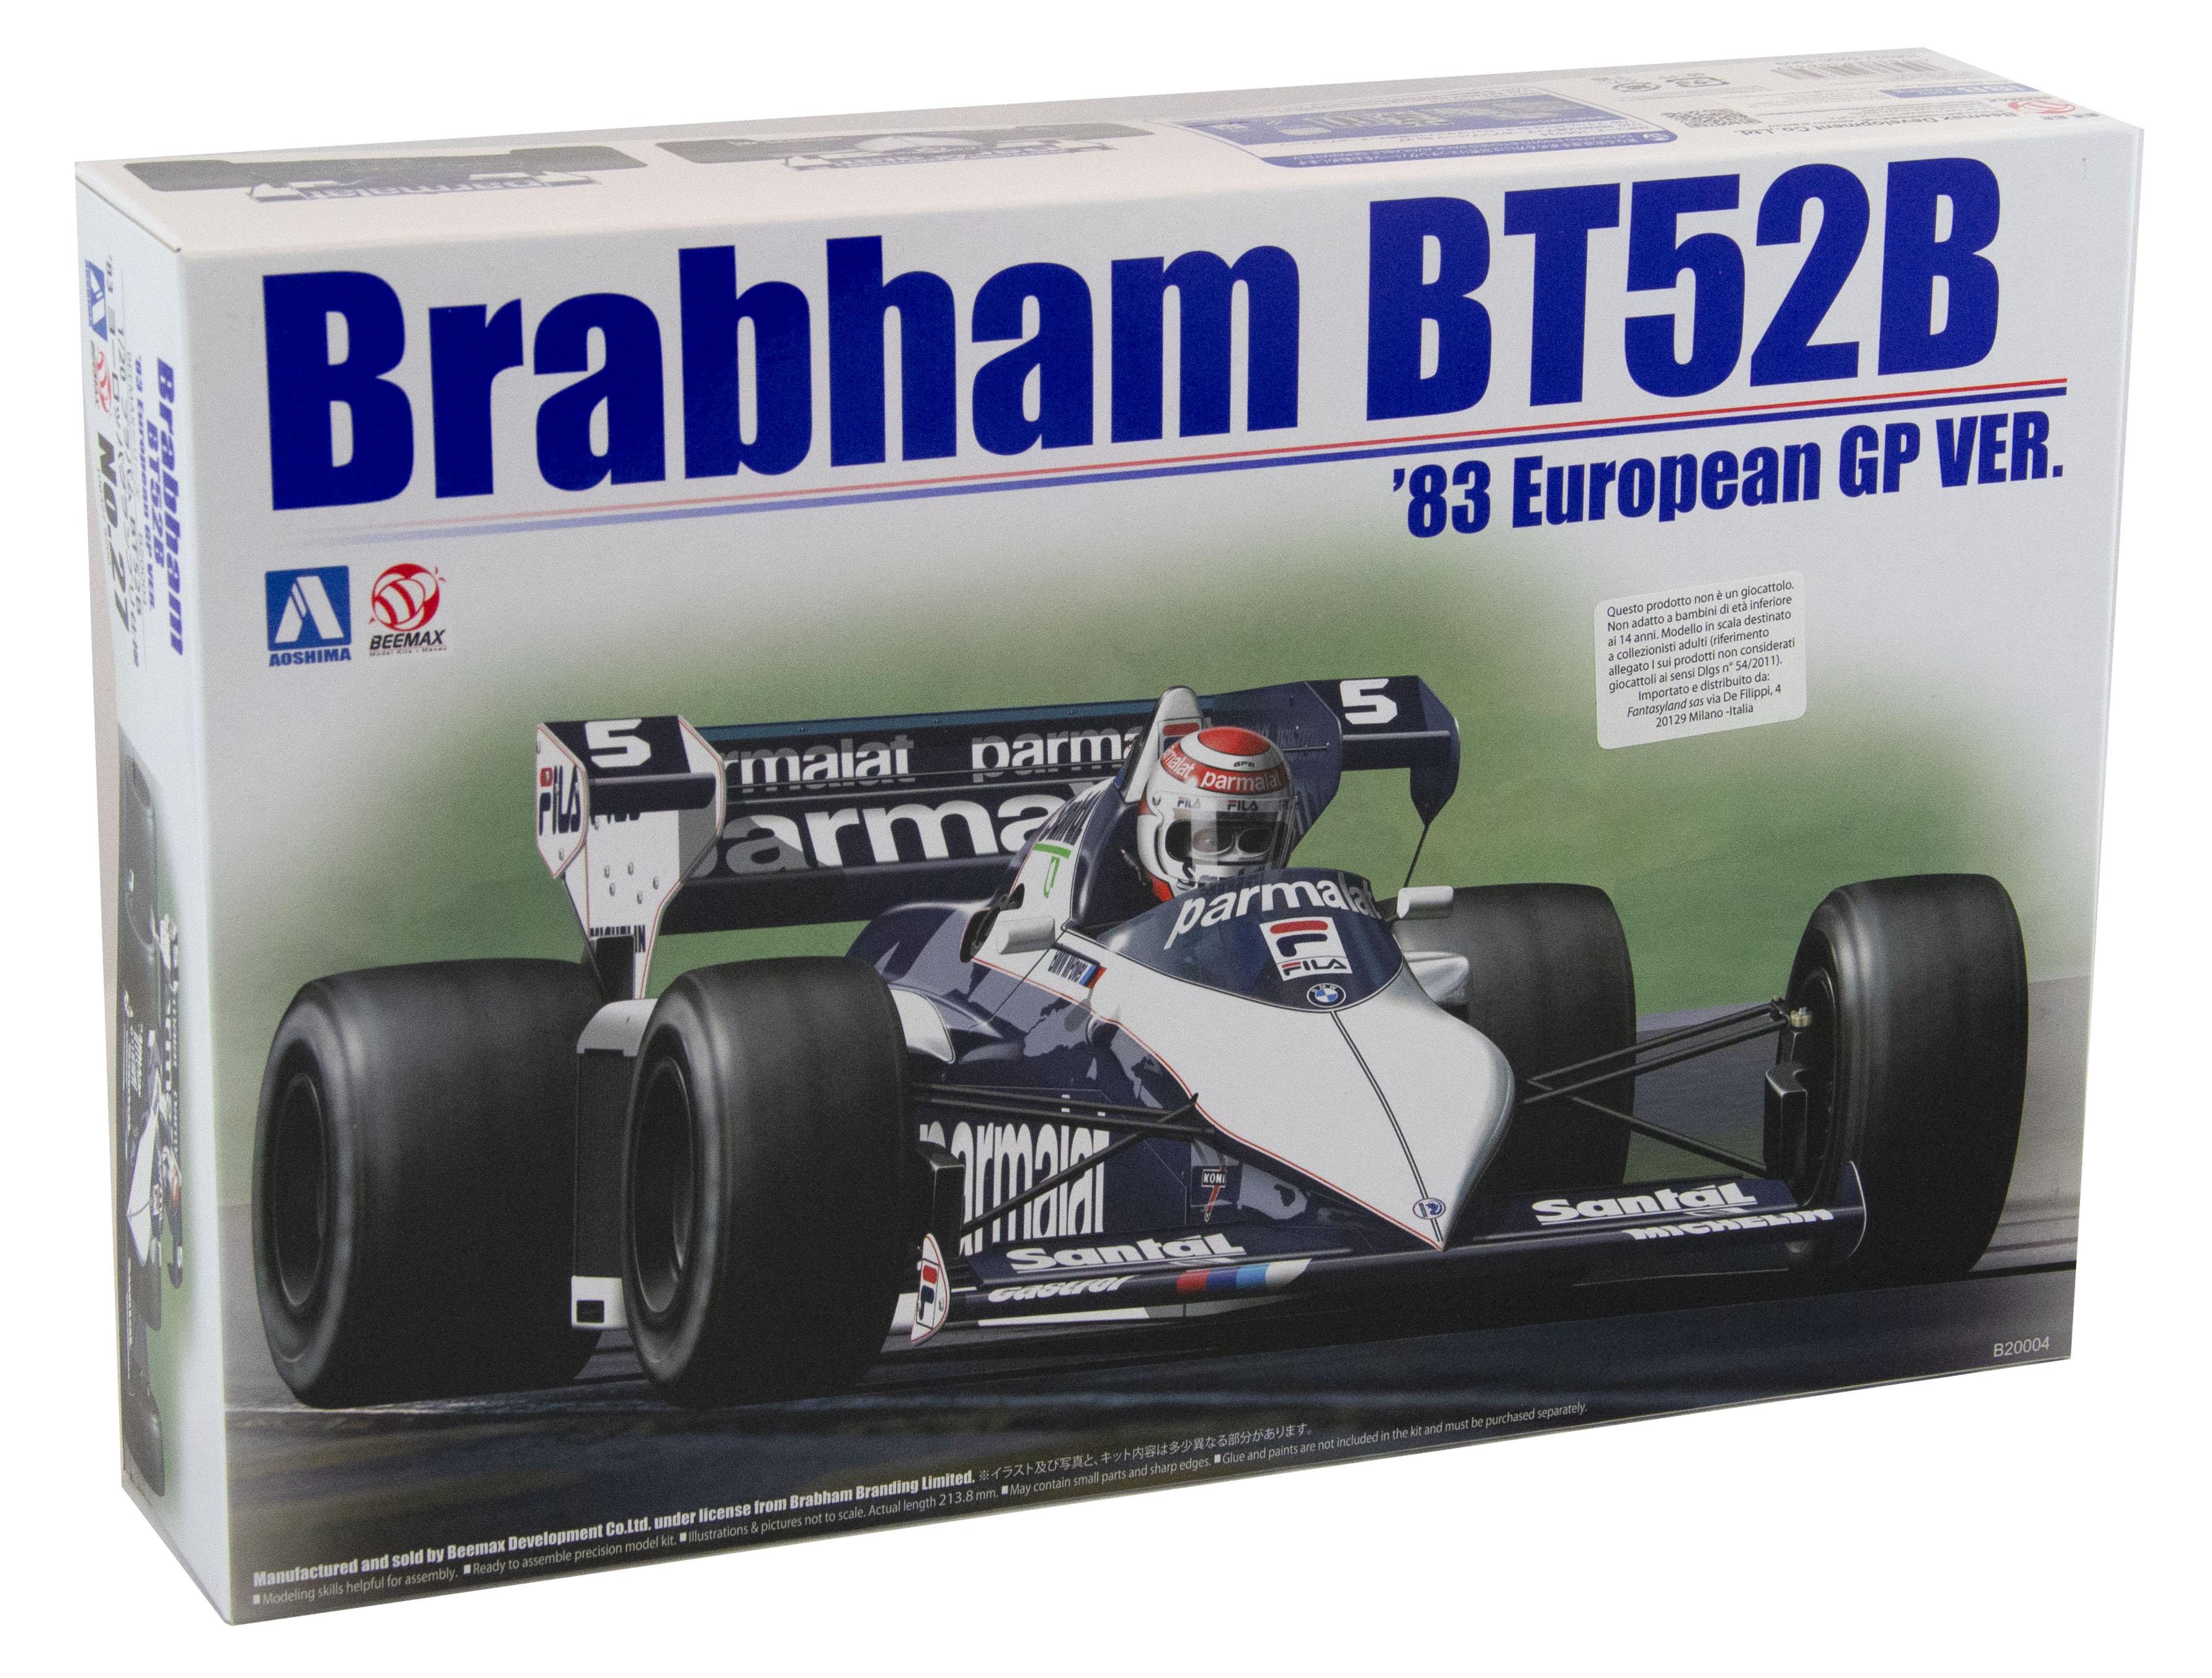 Kit Brabham Bt52b Gp Monza 1983 1/20